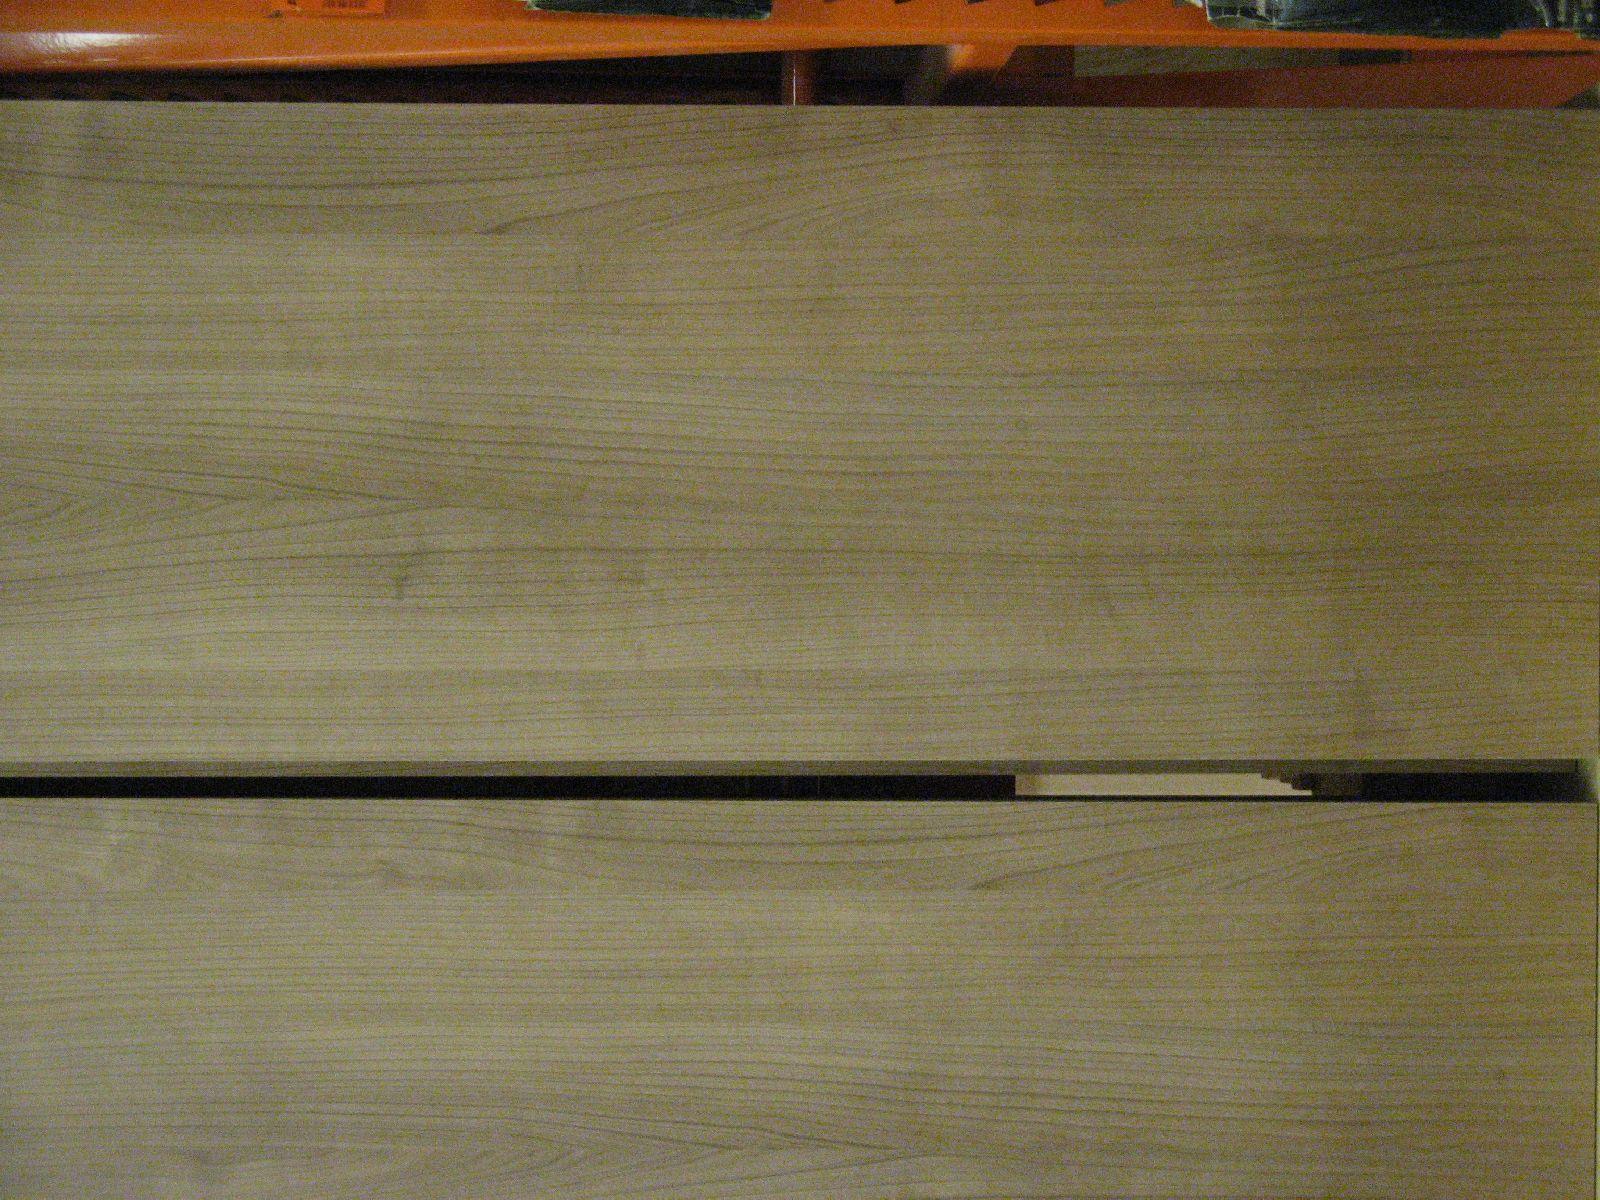 Wood_Textures_B_4747